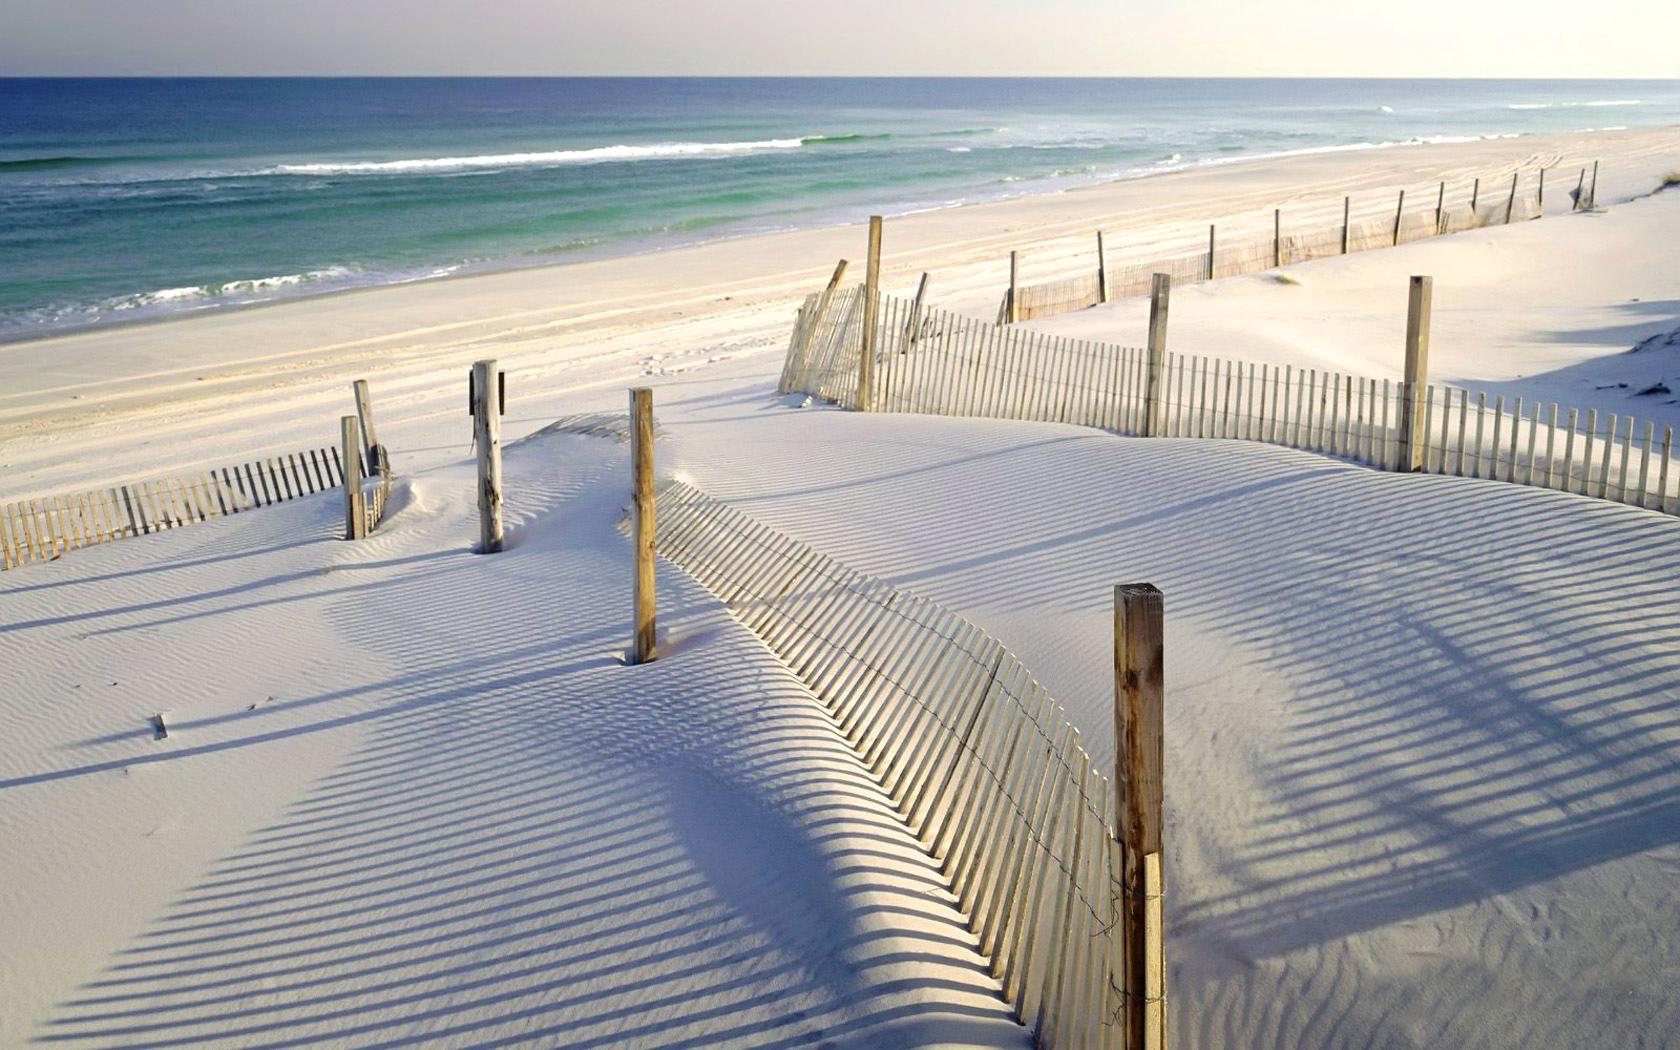 Sandy Beach Wallpaper: White Sandy Beach Wallpaper